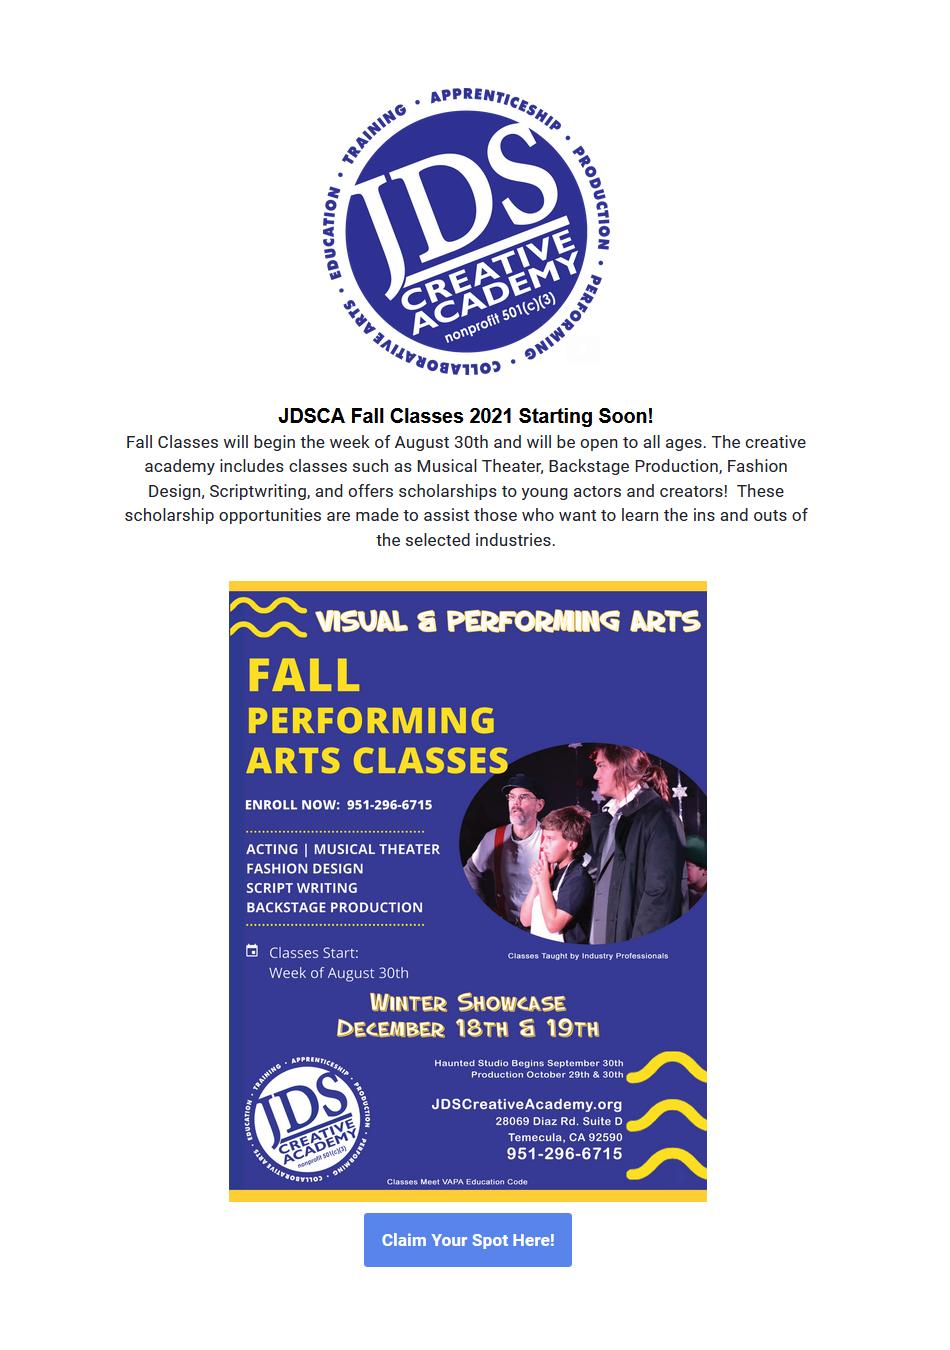 JDSCA Fall Classes 2021